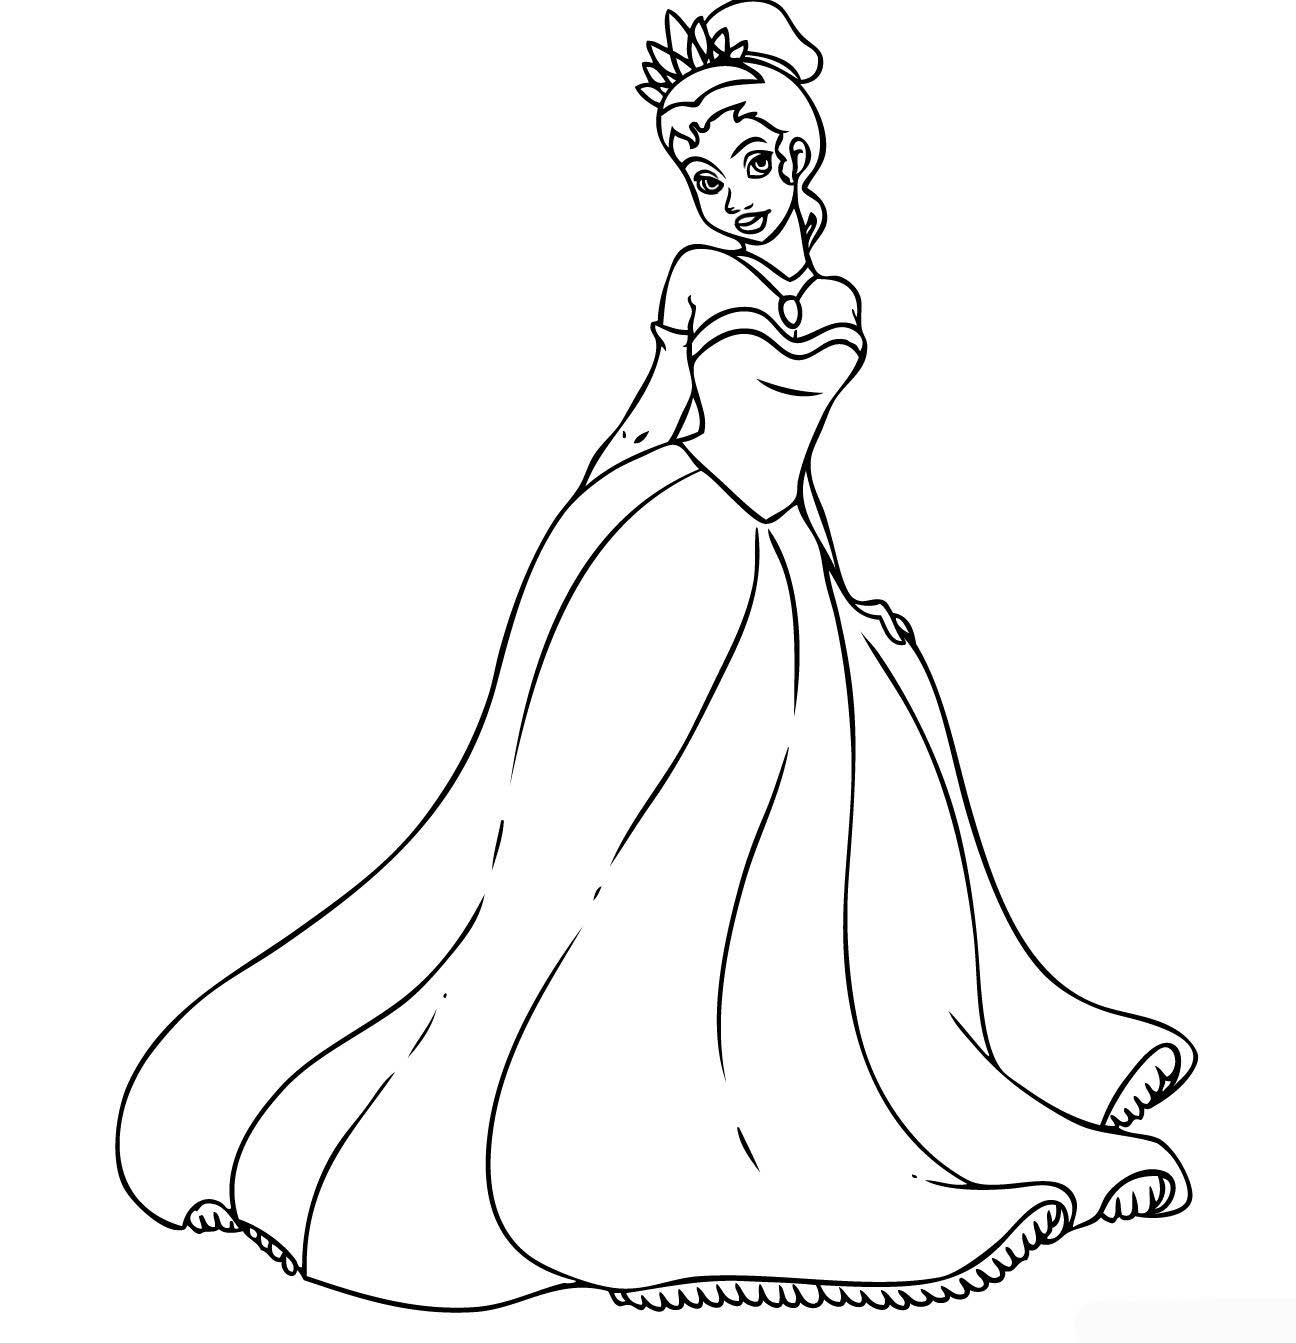 1296x1343 Princess Tiana Coloring Pages